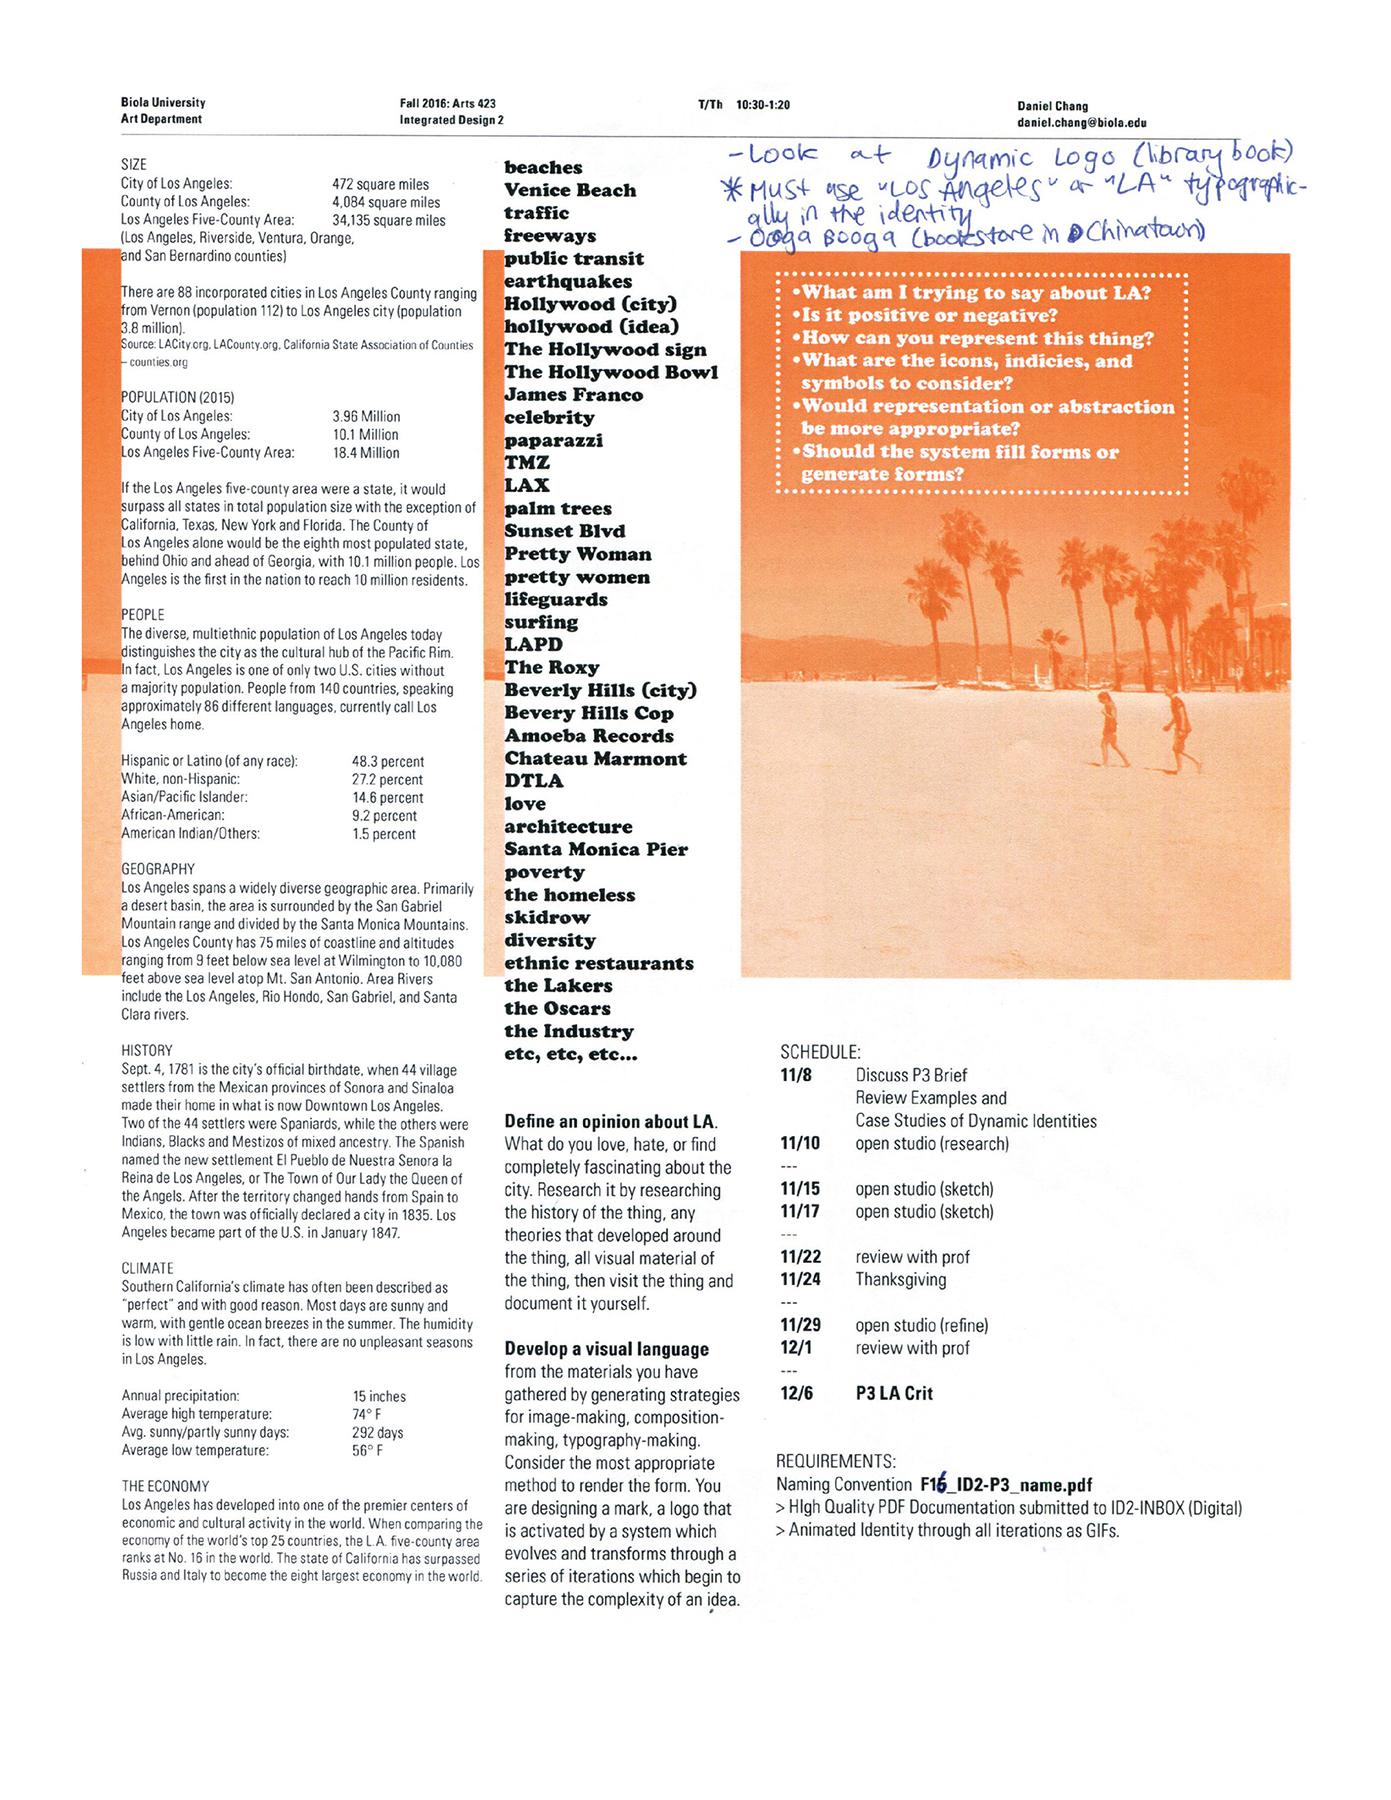 F16_ID2-P3_JannaChristian Documentation_Page_03.jpg